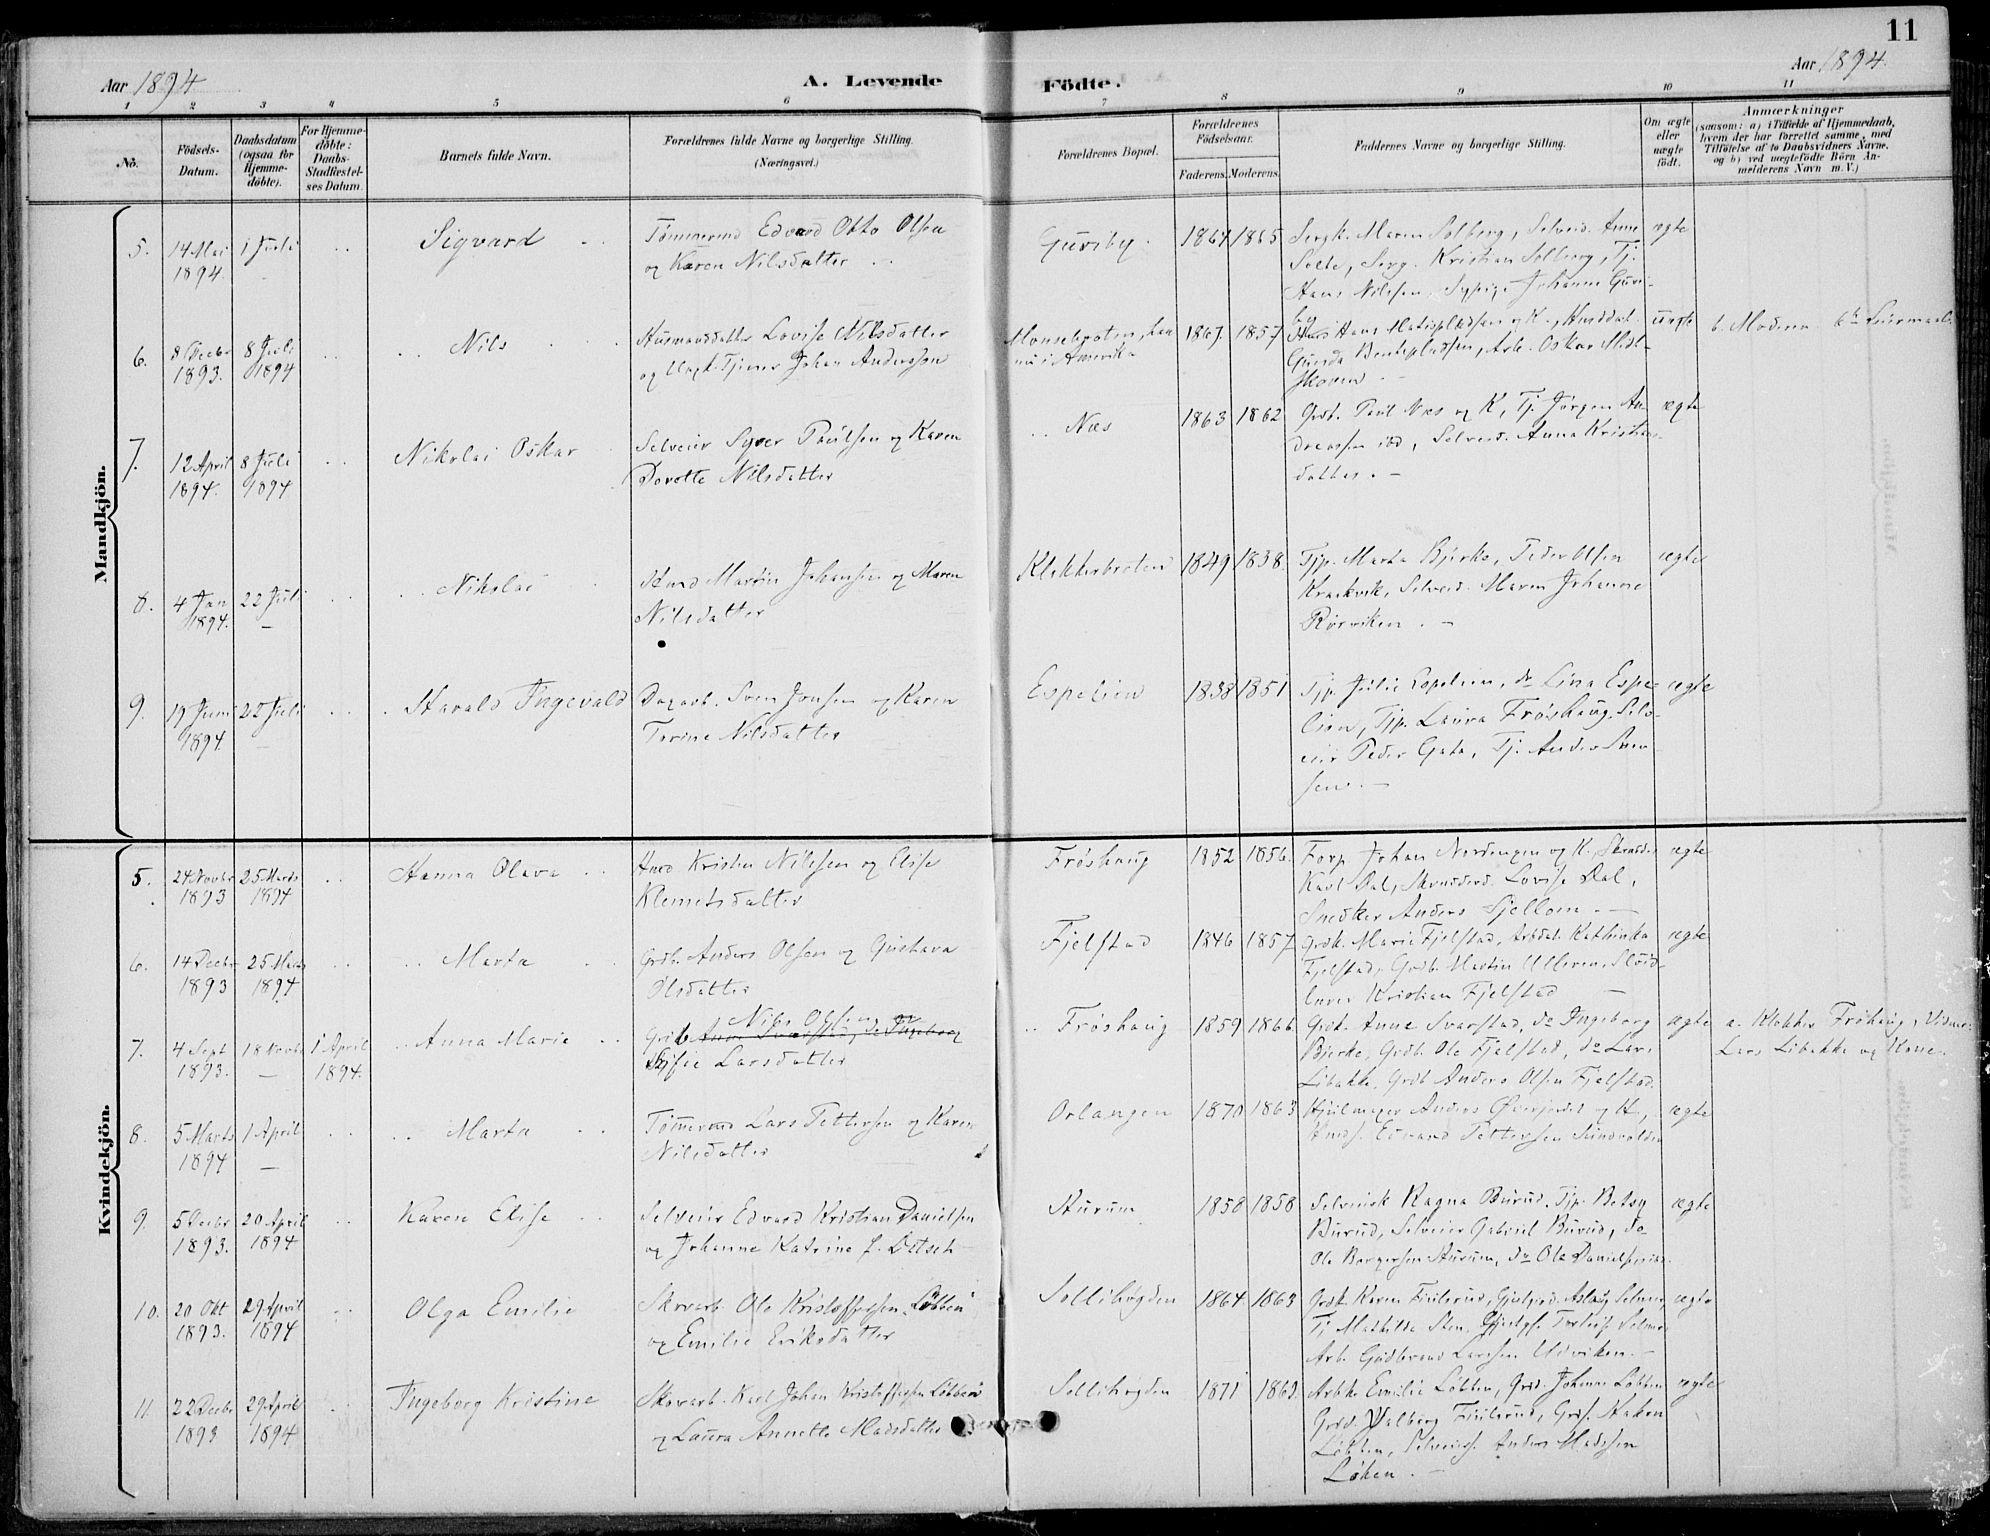 SAKO, Hole kirkebøker, F/Fa/L0009: Ministerialbok nr. I 9, 1892-1907, s. 11